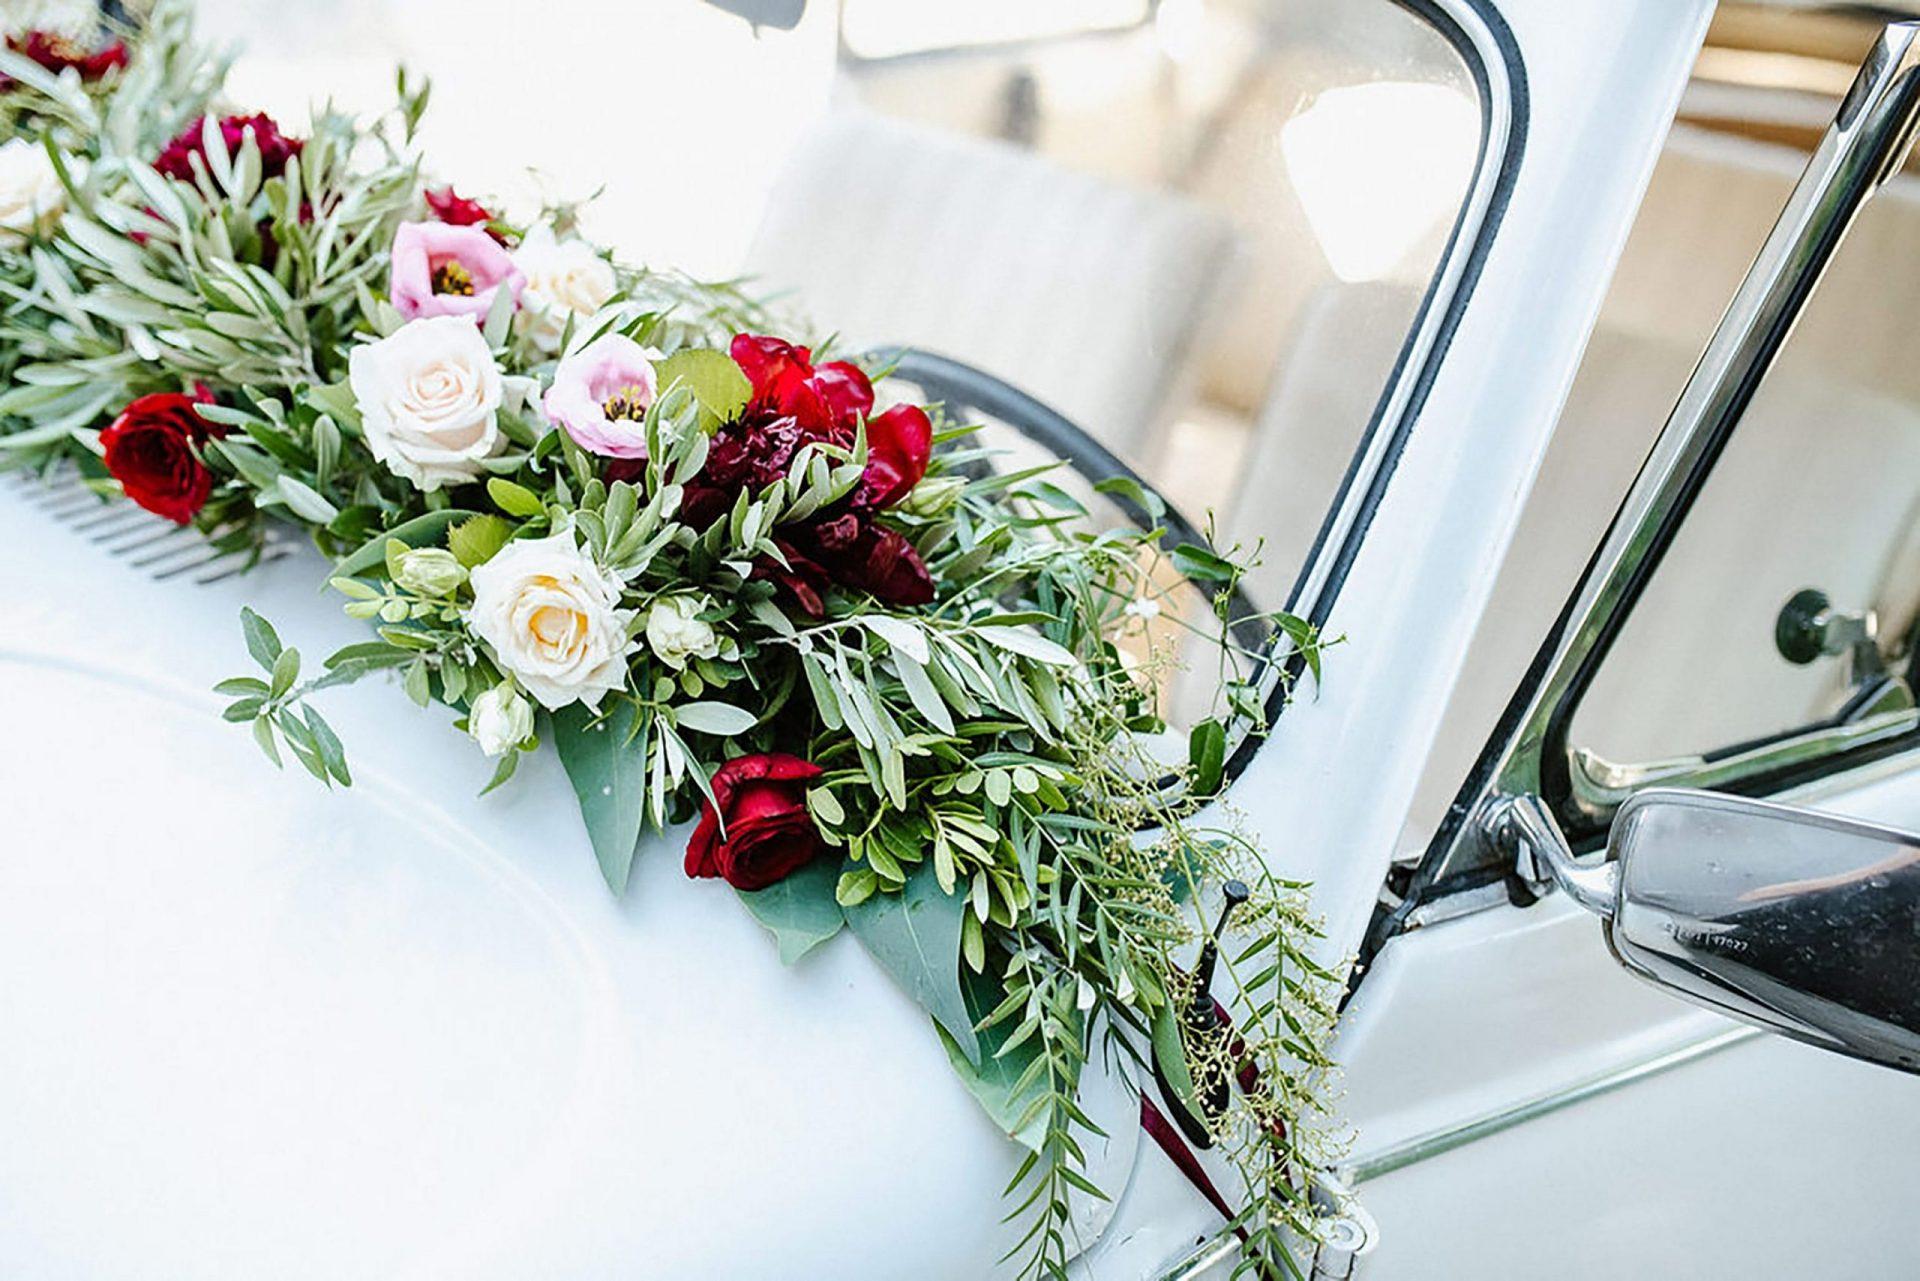 Marianna & Matteo, wedding car flowers decoration